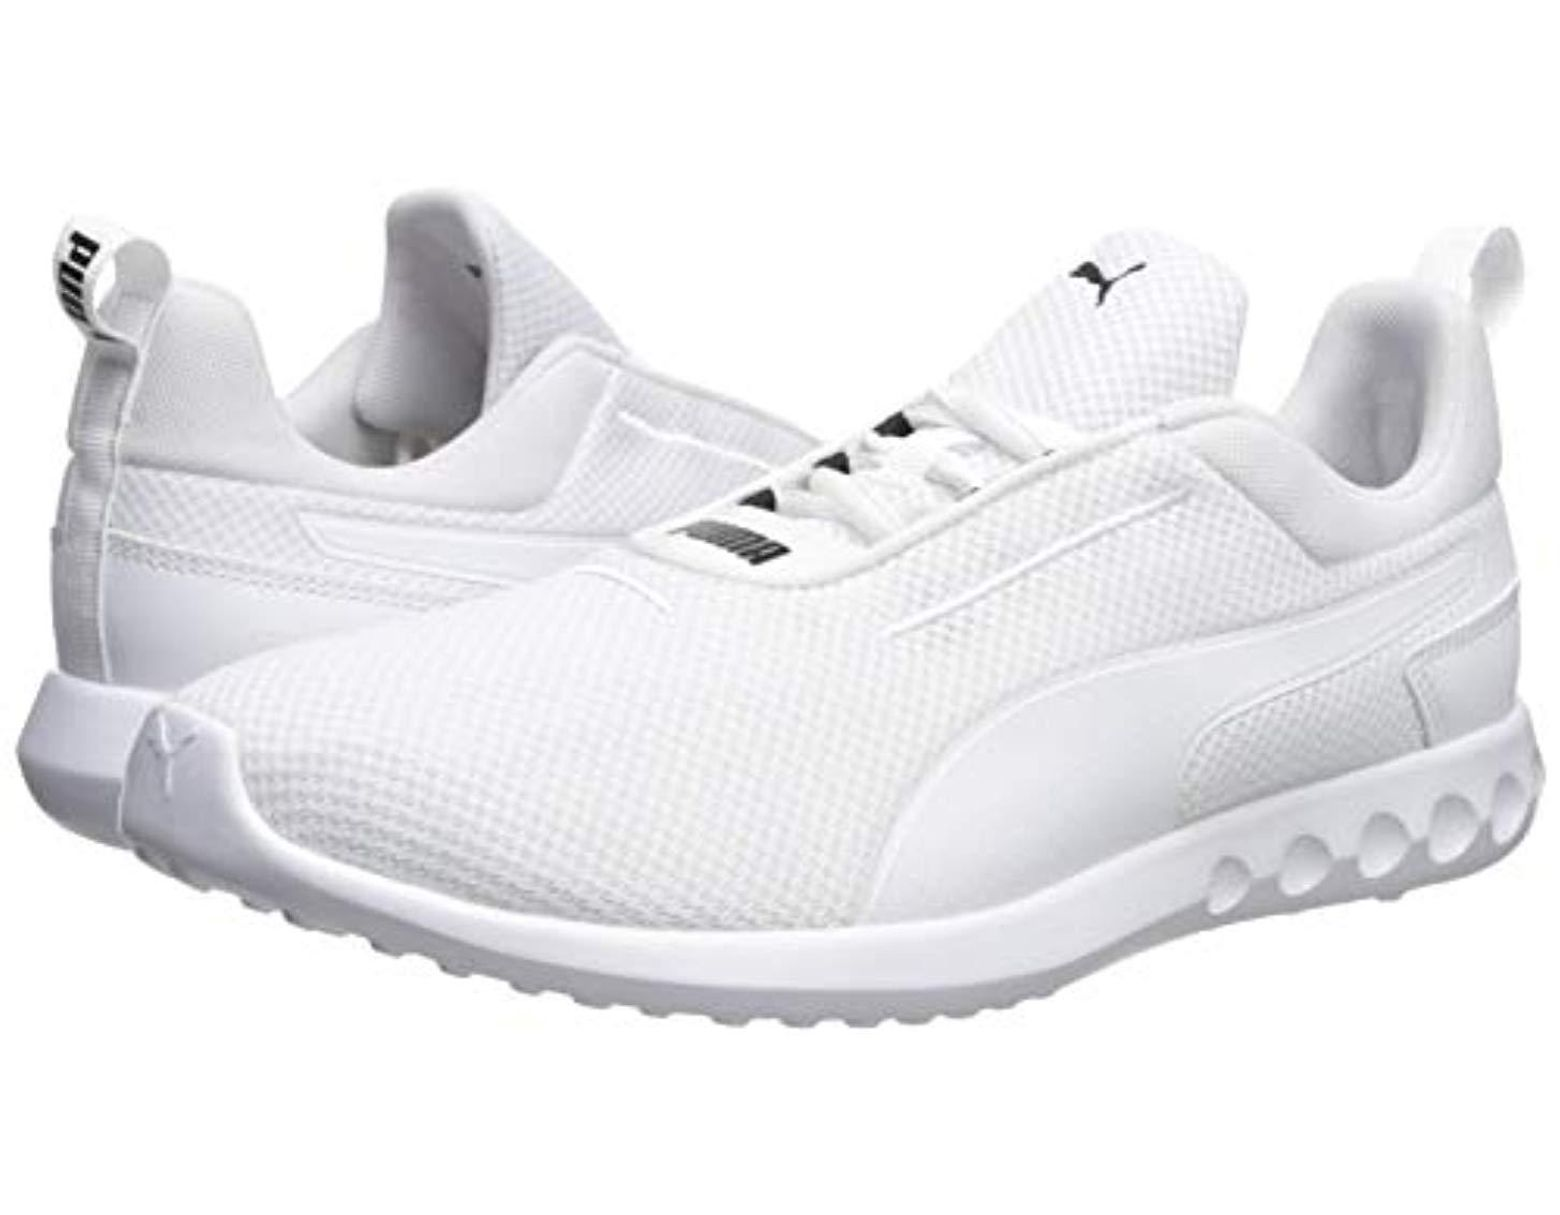 eecfdcd491 Men's White Carson 2 Shoe